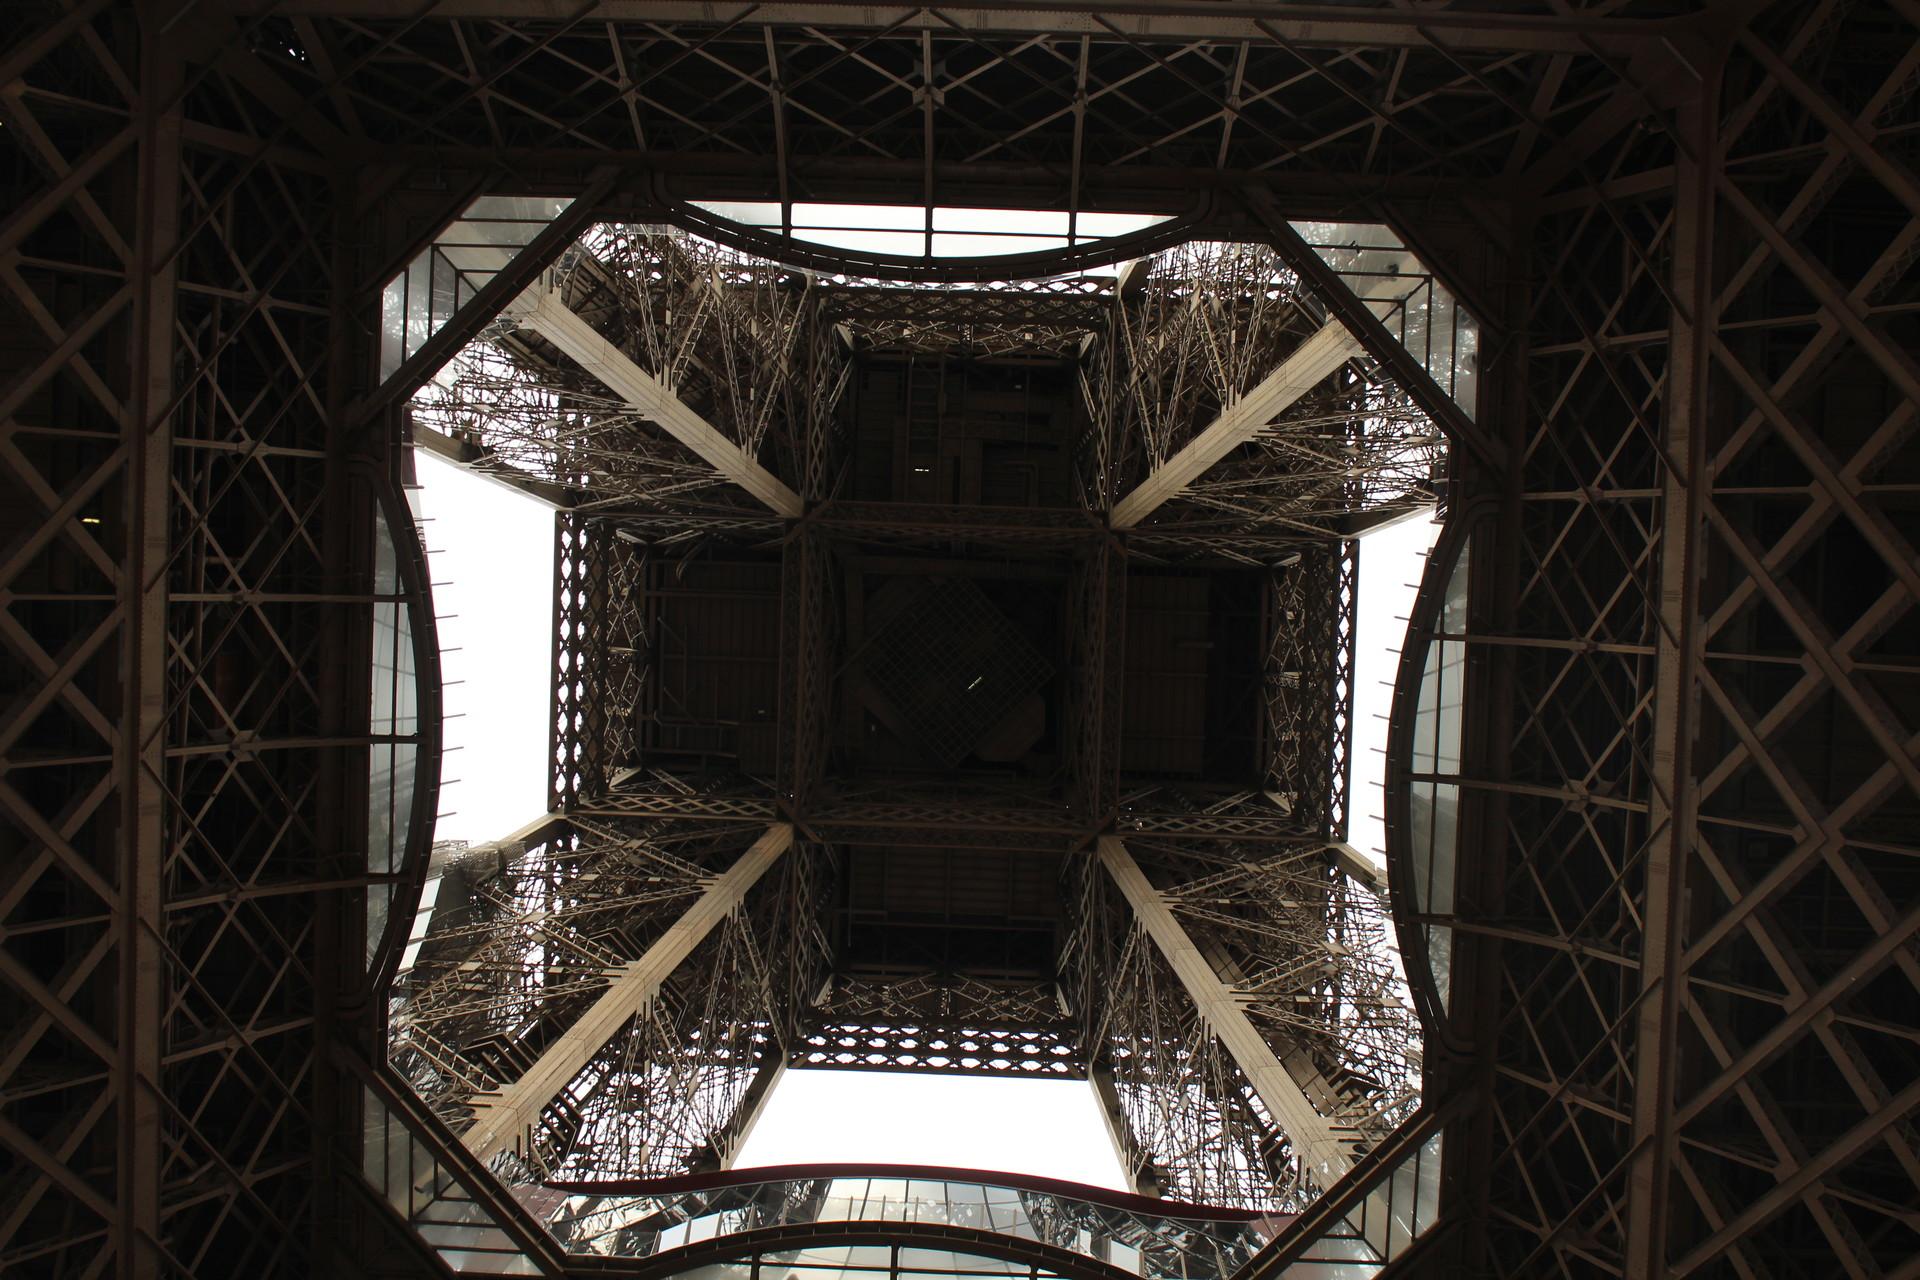 The Eiffel Tower garden